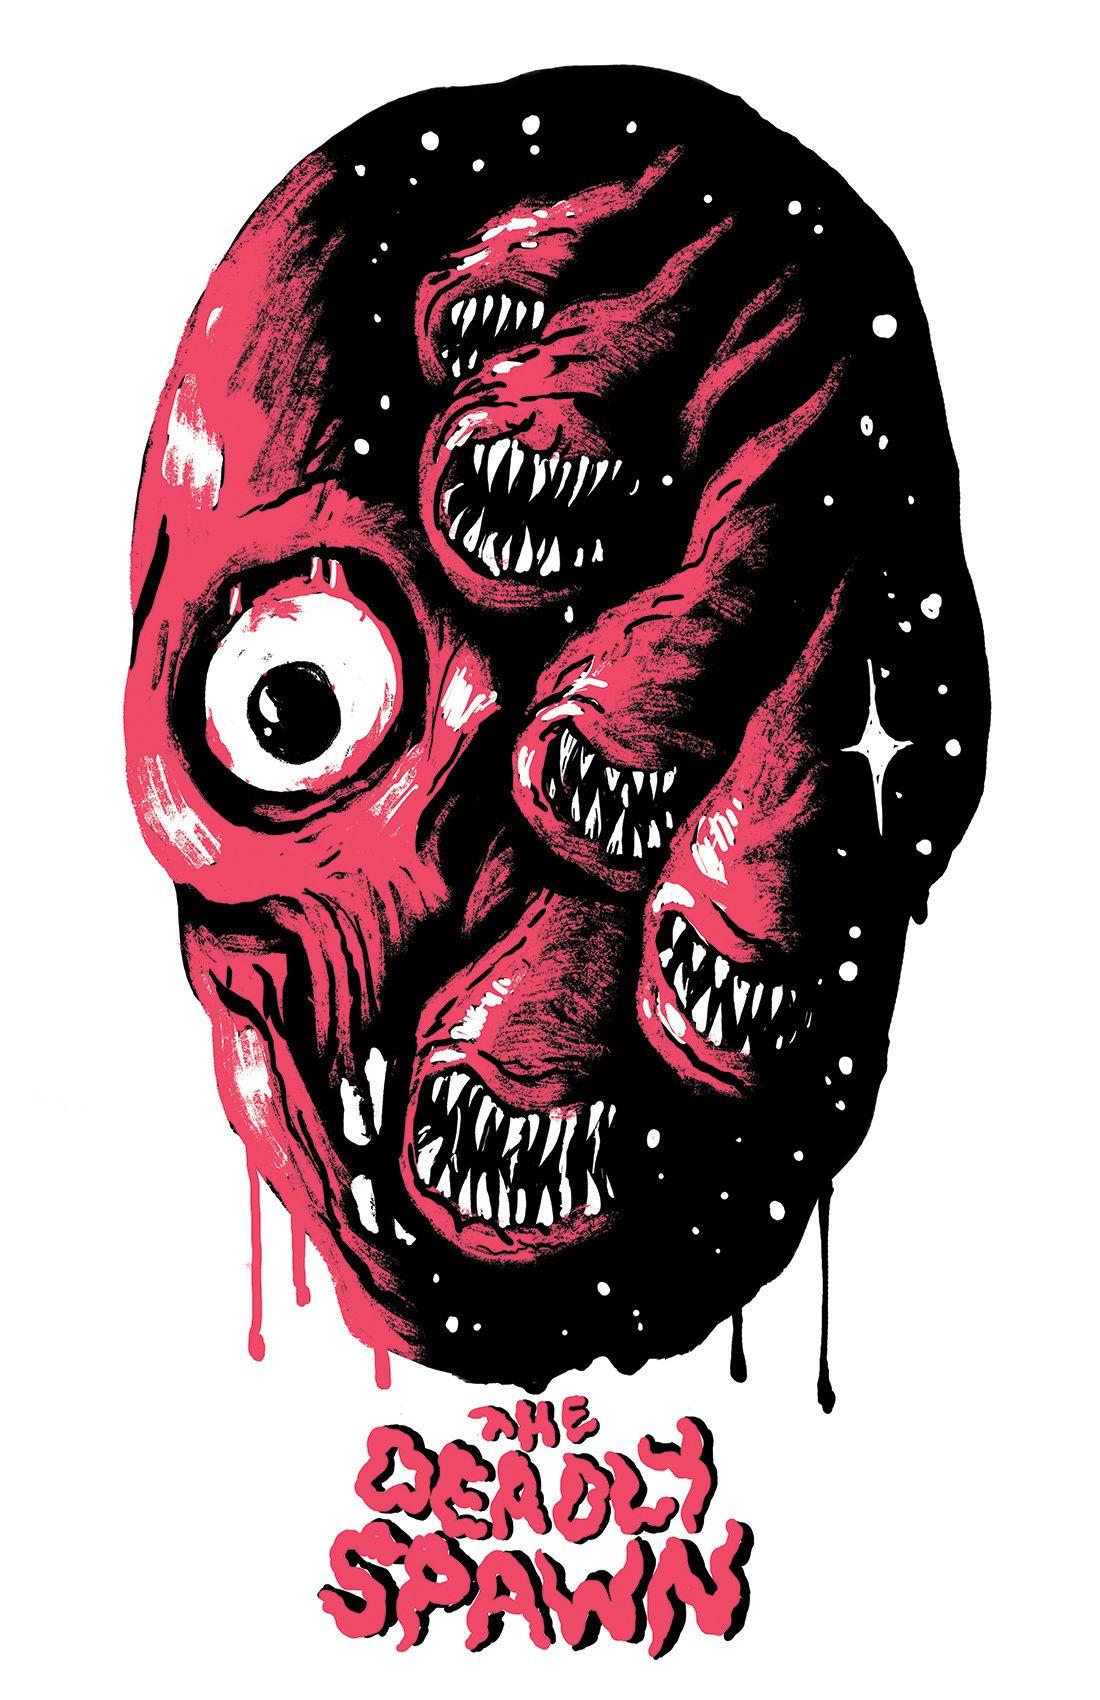 Gallery trevor henderson in 2020 horror movie art